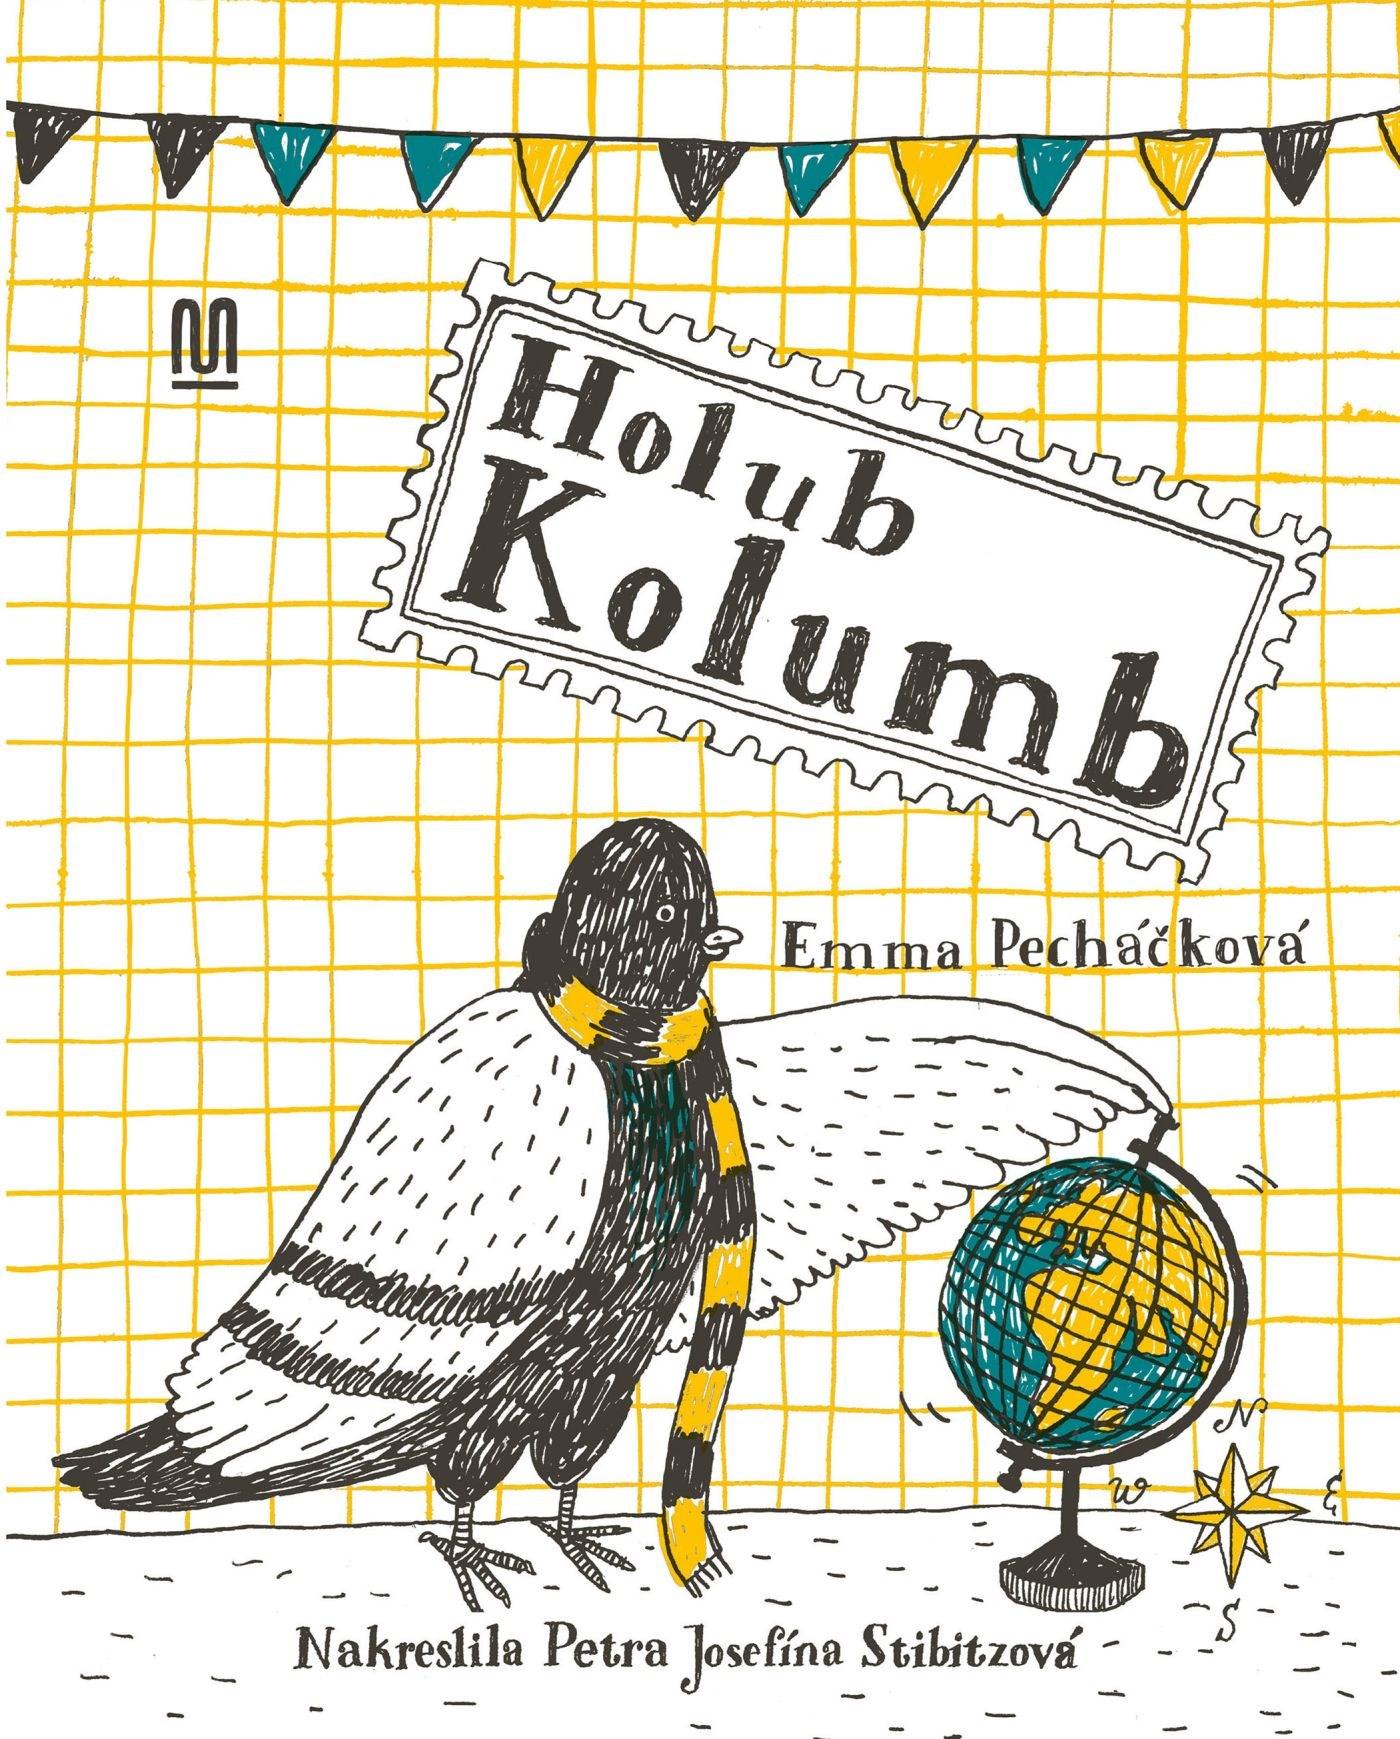 Meander Holub Kolumb - Emma Pecháčková